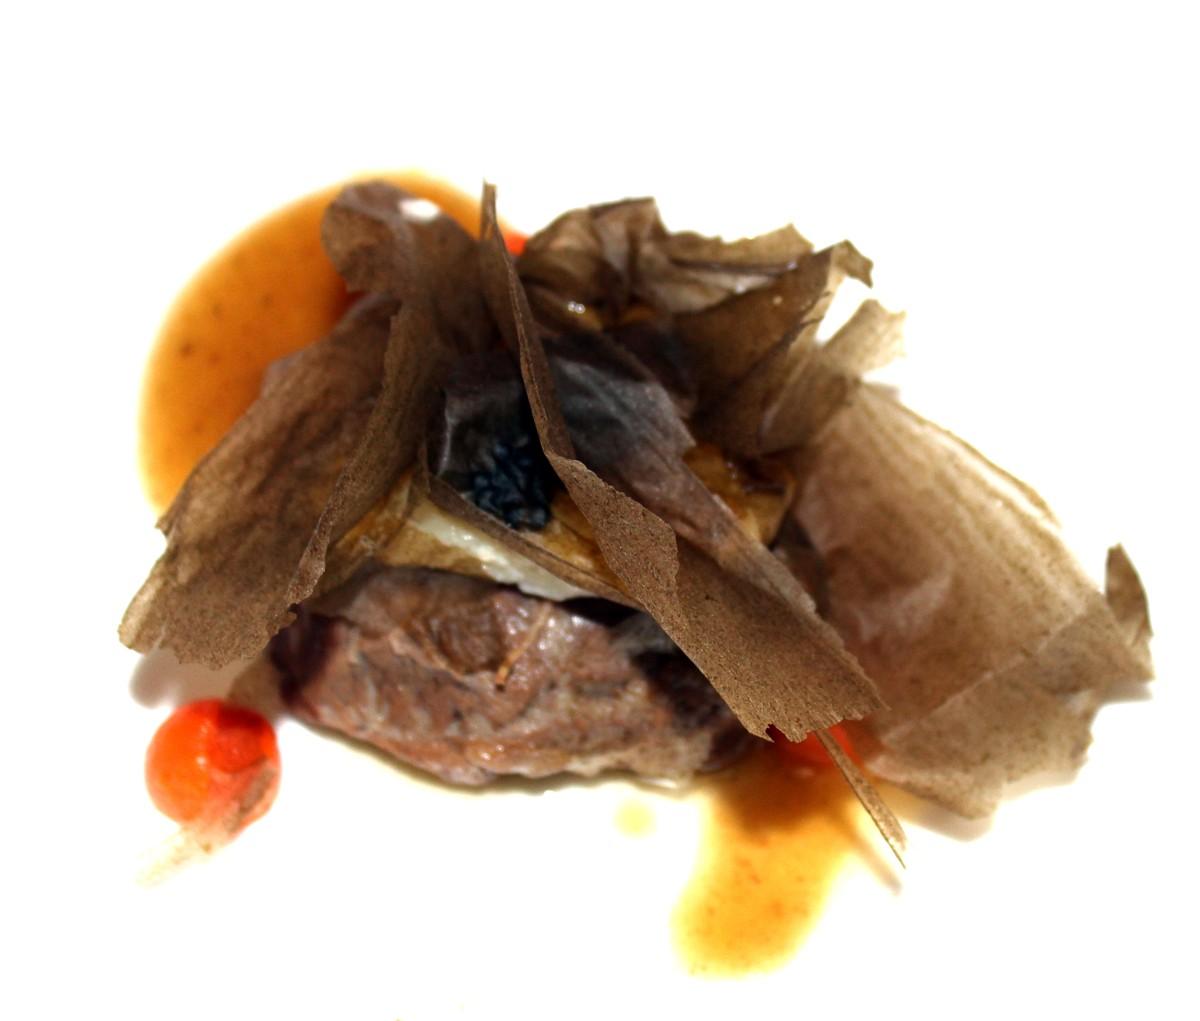 Carrillera de cerdo y carrillera de rape en salsa de Albariño